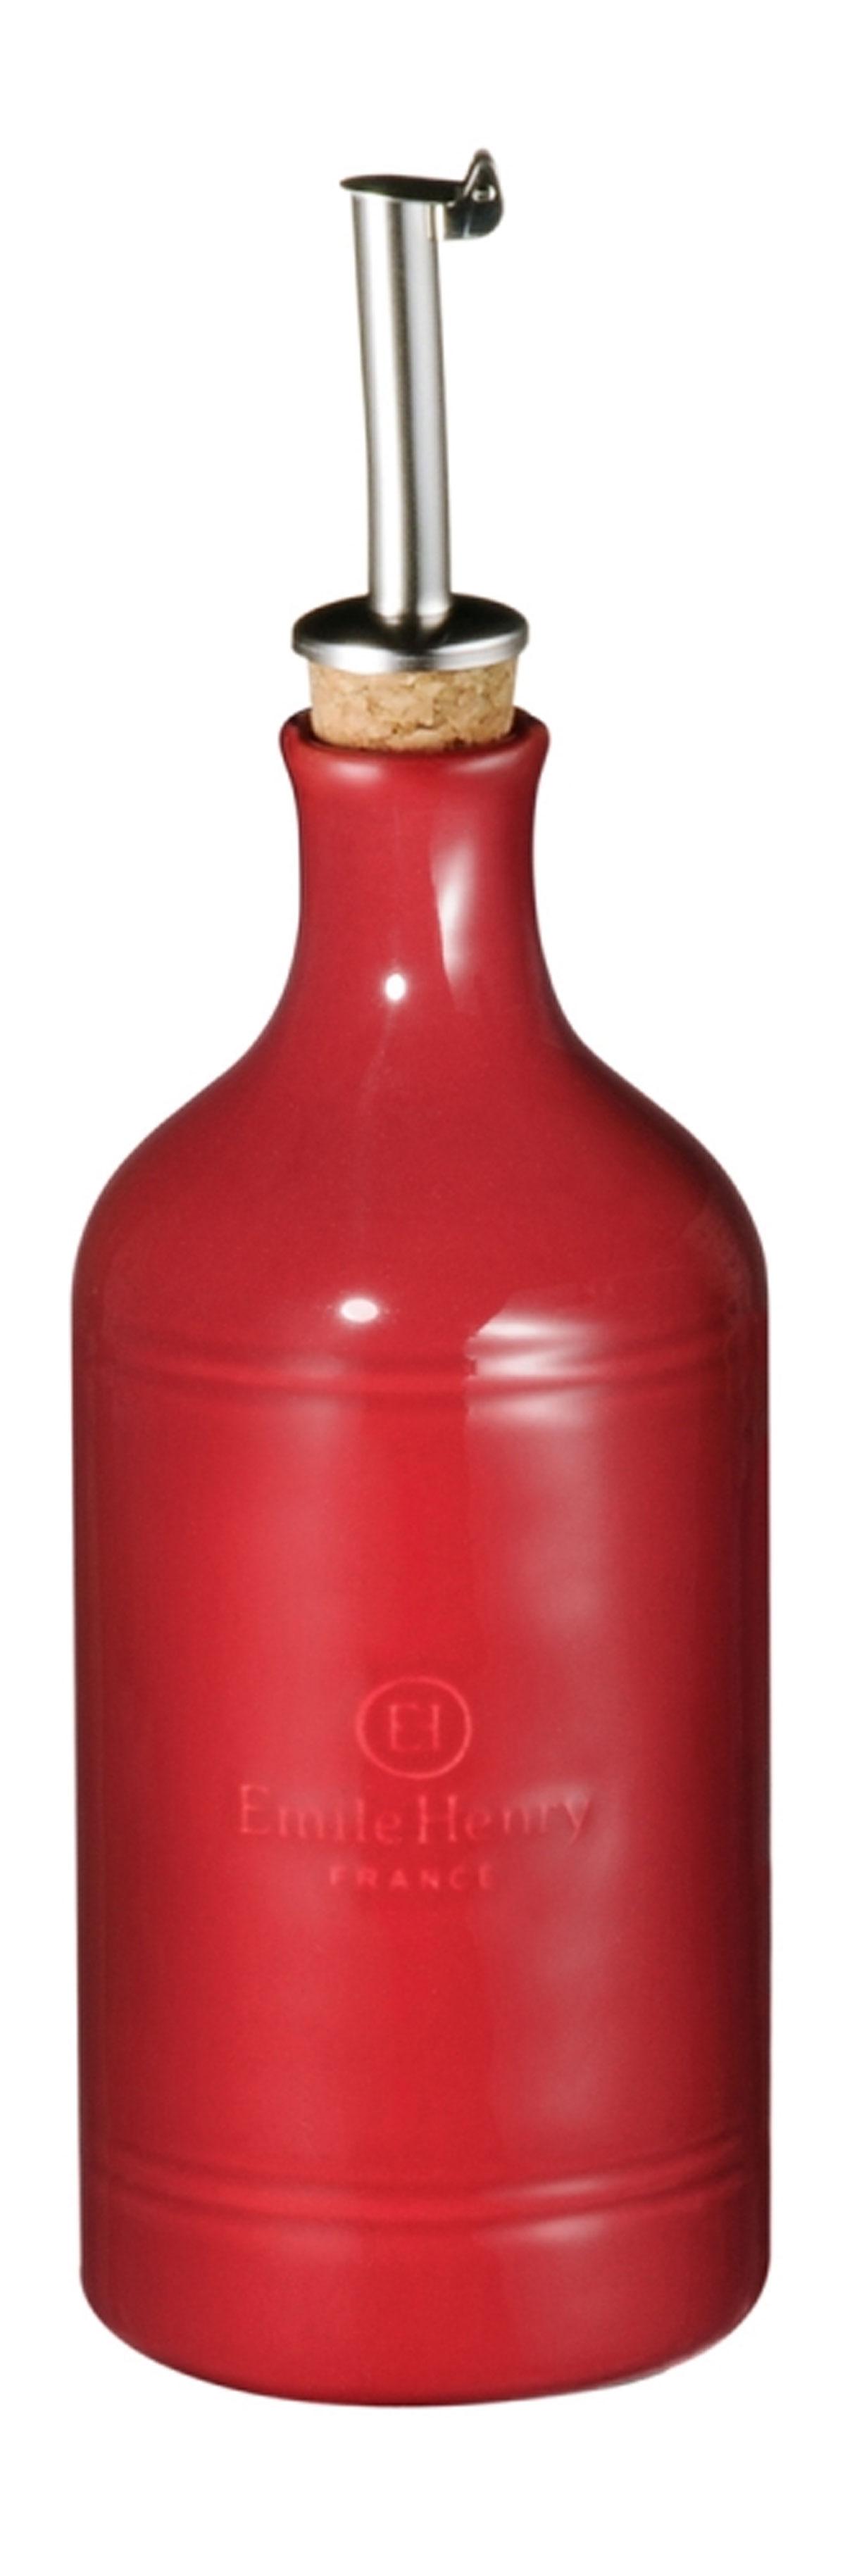 Бутылка для масла и уксуса Emile Henry Natural Chic, цвет: гранат, 450 мл солонка emile henry natural chic цвет гранат диаметр 10 см